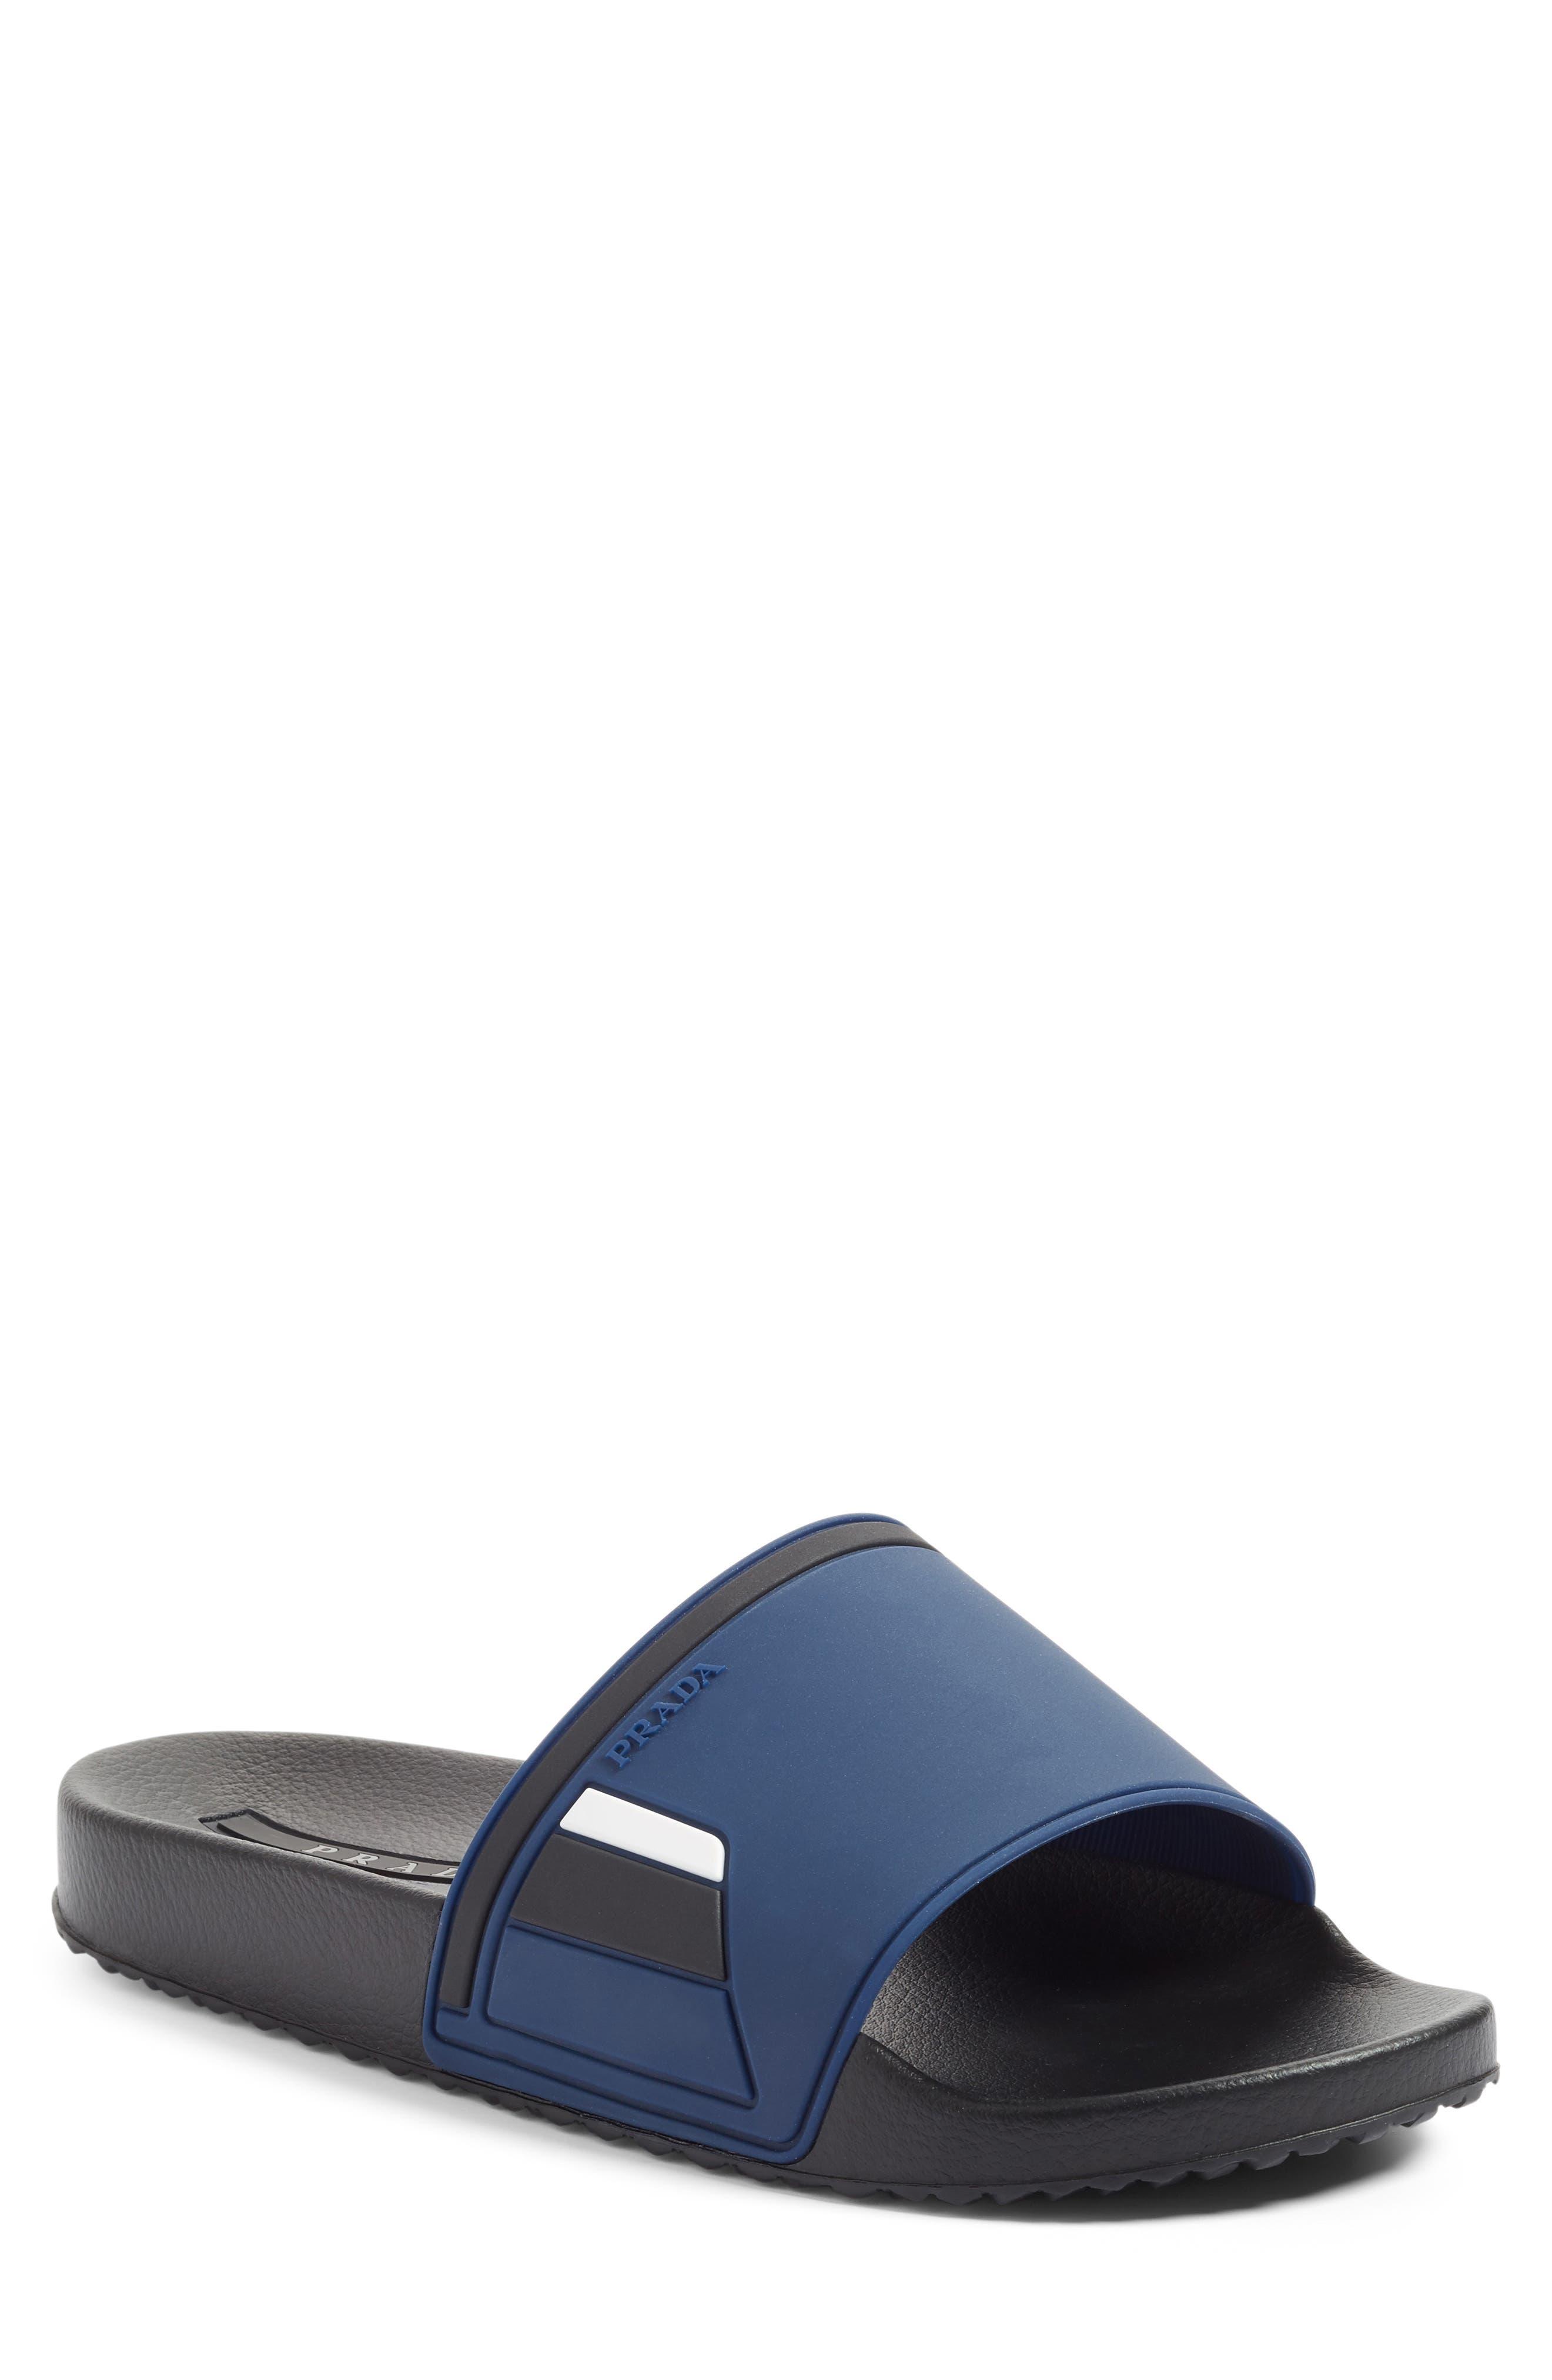 Alternate Image 1 Selected - Prada Linea Rossa Sport Sandal (Men)